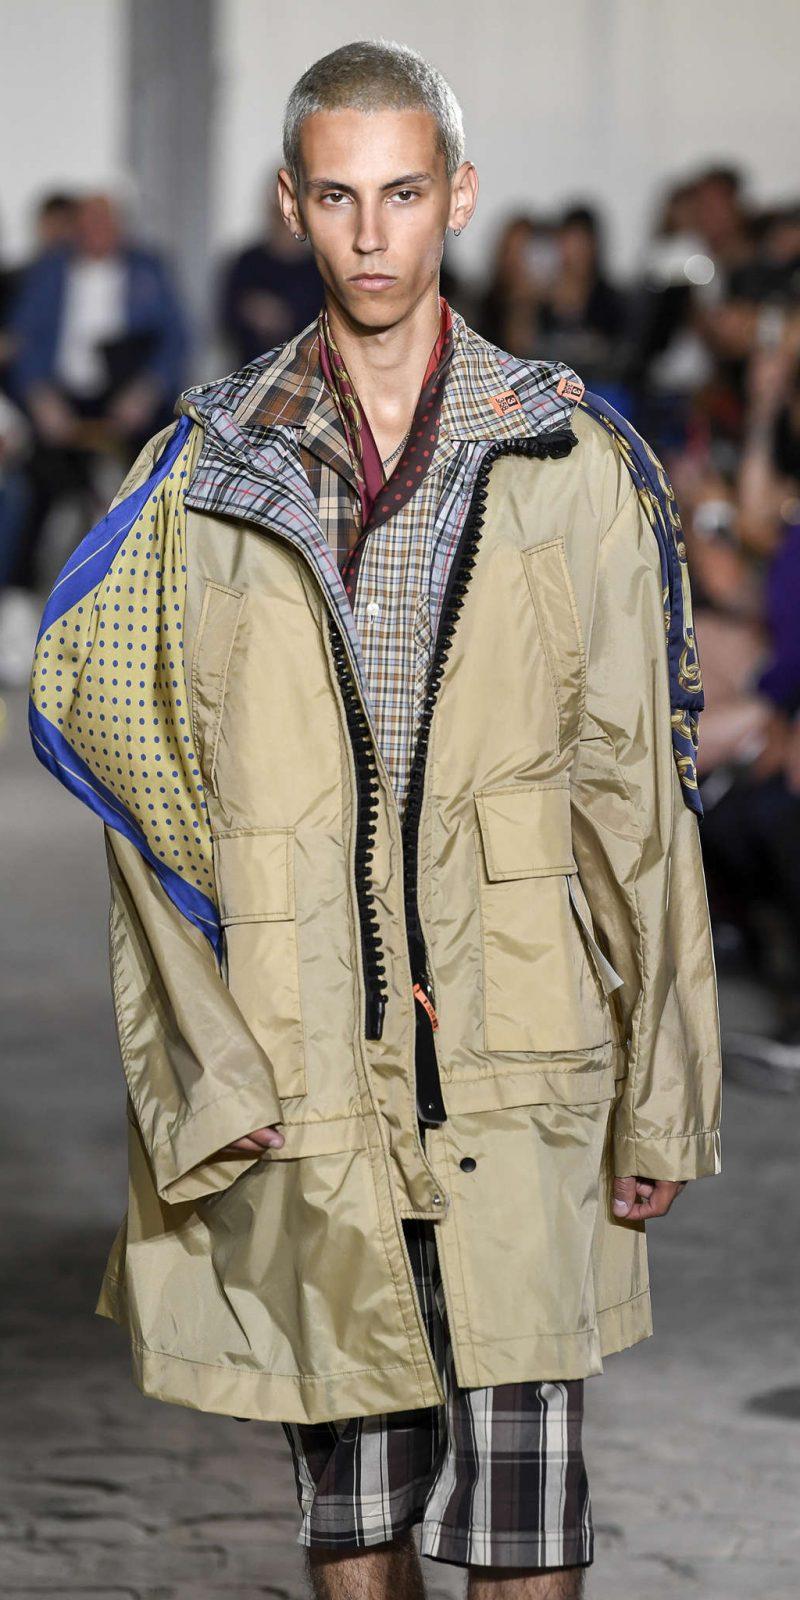 Mihara Yasuhiro Paris Fashion Week Show 2018 8